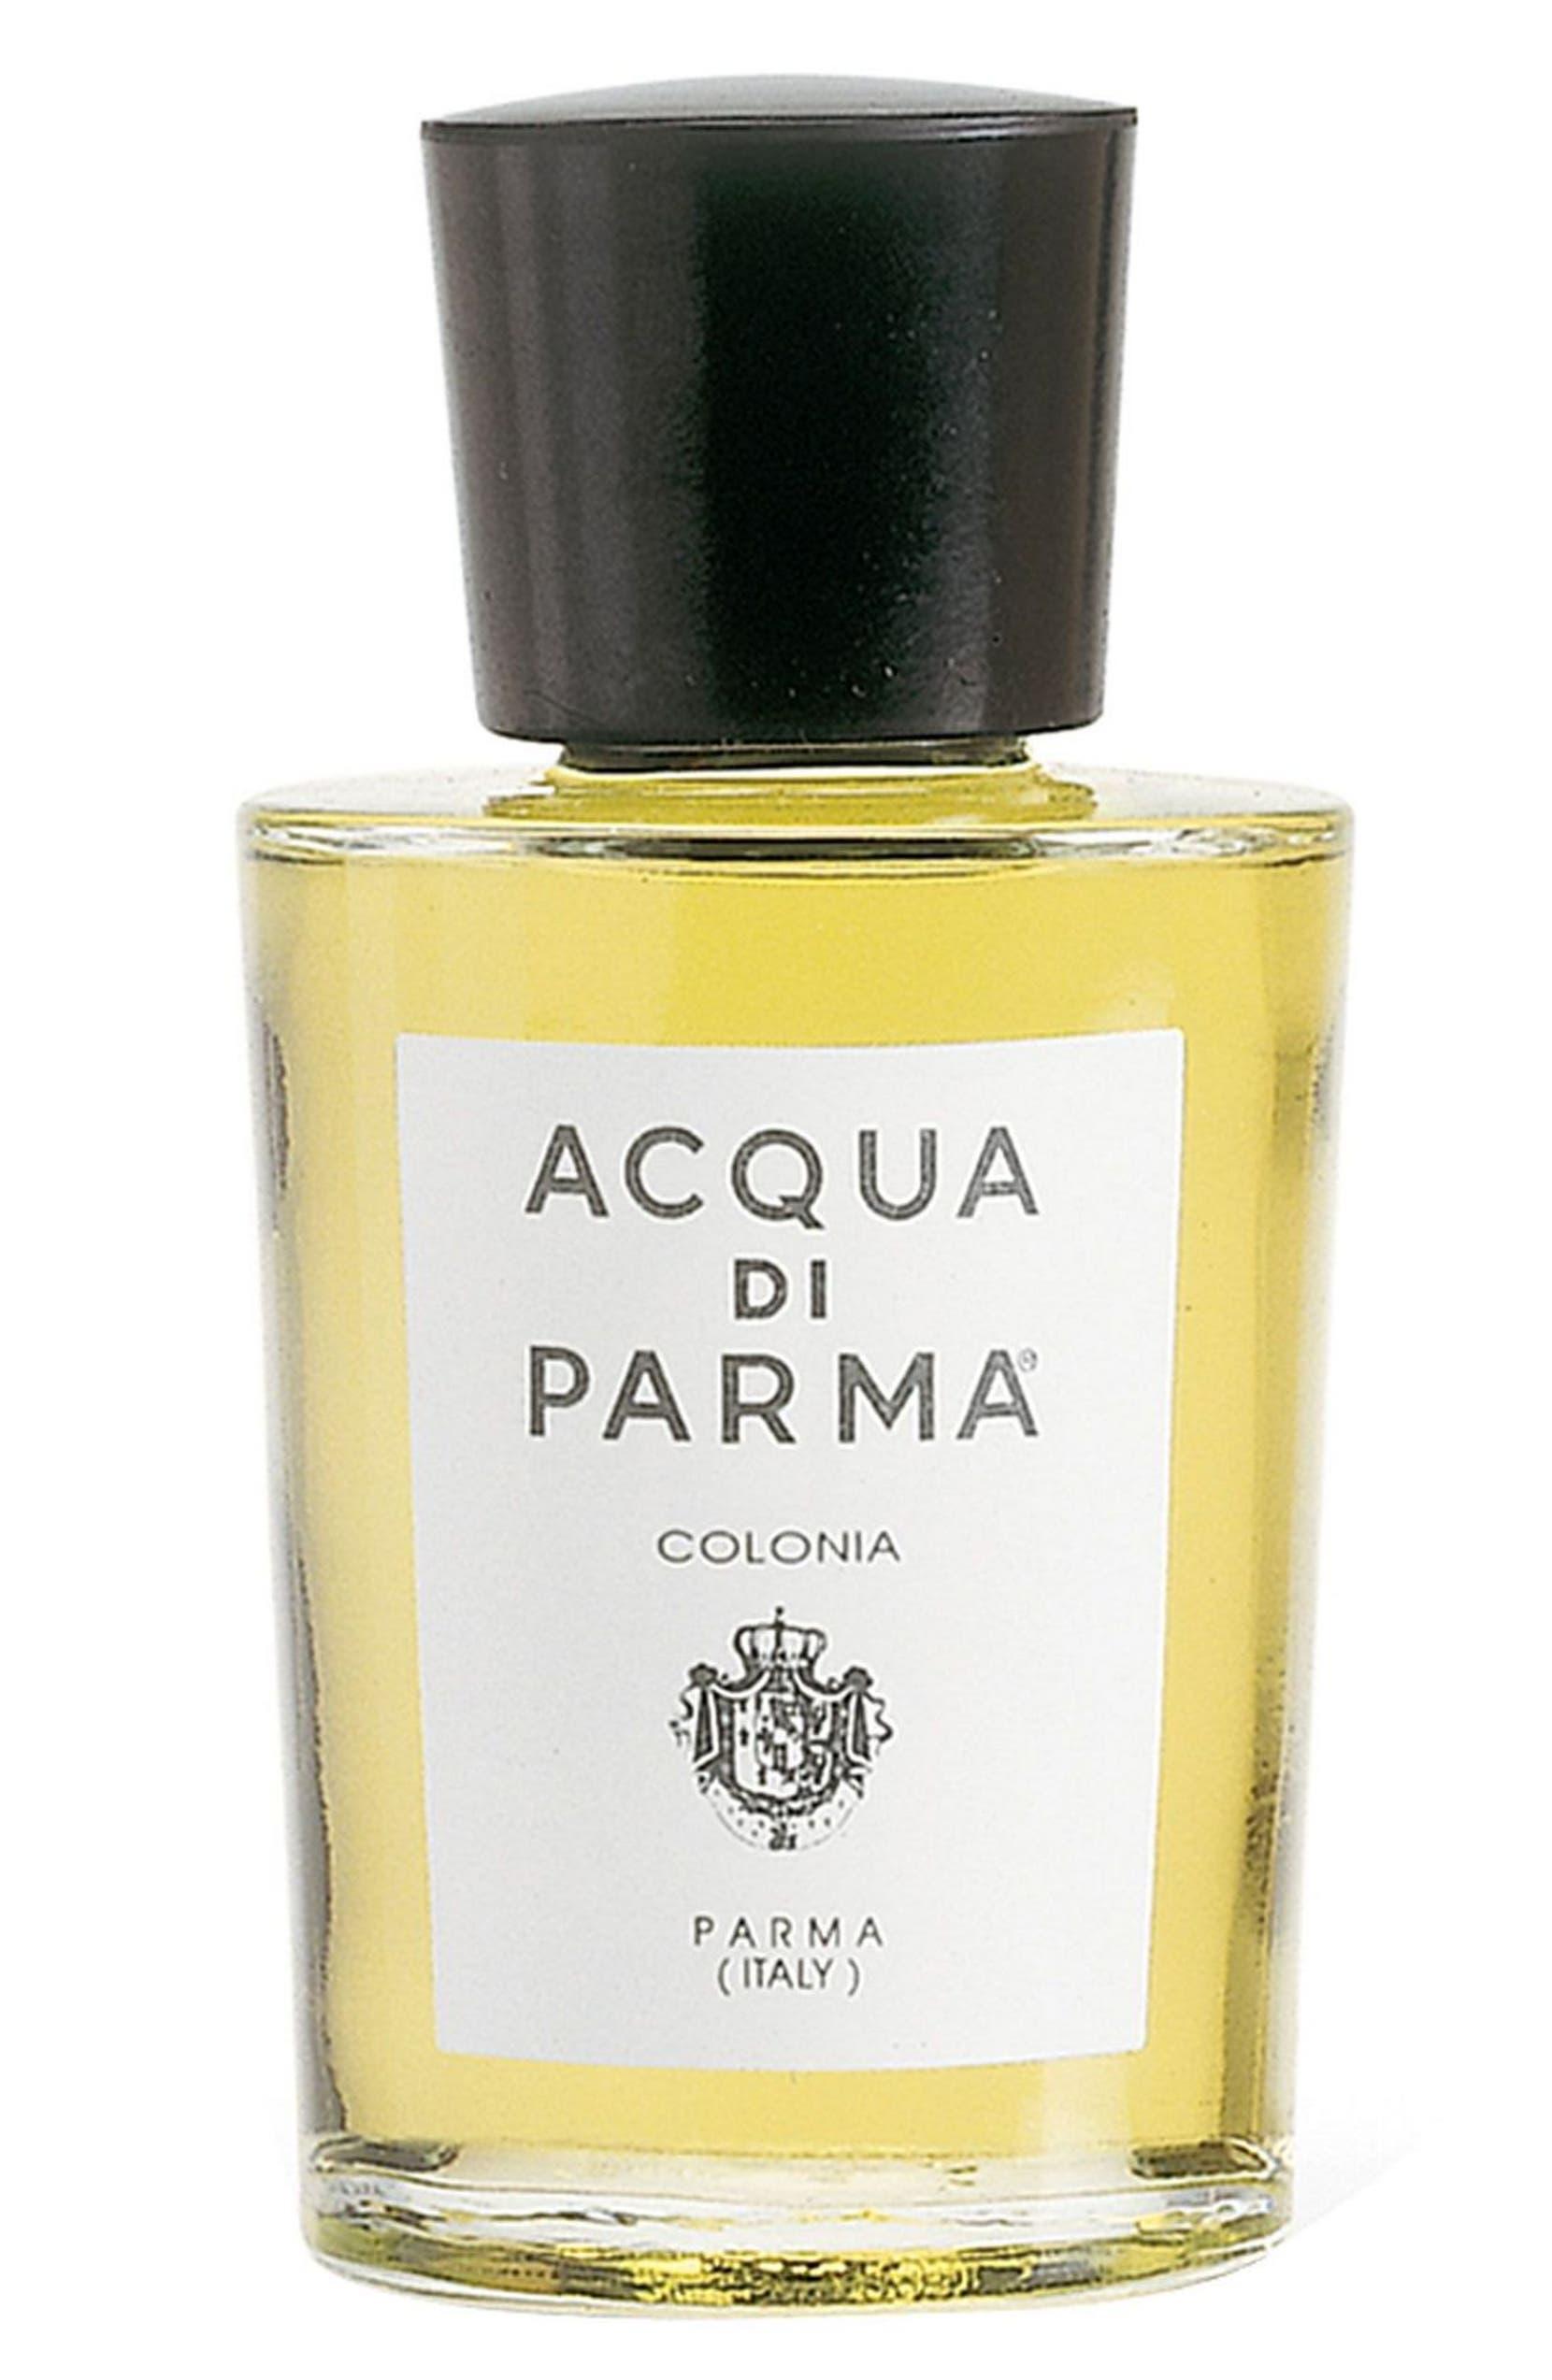 Acqua di Parma \'Colonia\' Eau de Cologne Natural Spray | Nordstrom